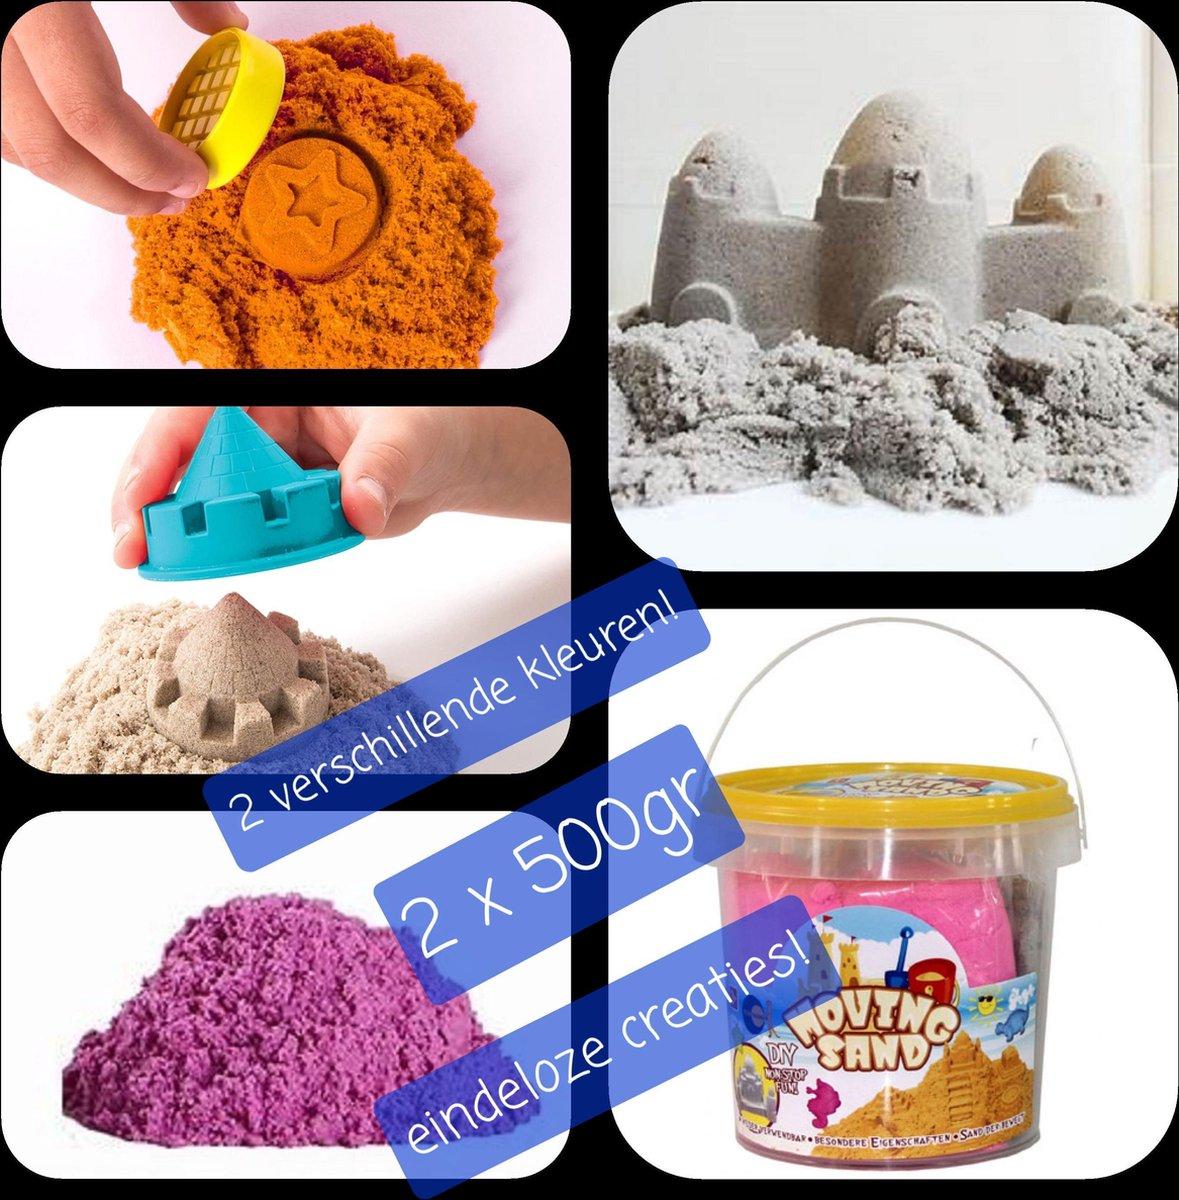 Speelzand - Kinetisch Zand - Bewegend Zand -in handige emmer- 2 x 500g -2kleuren- Magisch Zand- Magic Sand- Speelgoedzand